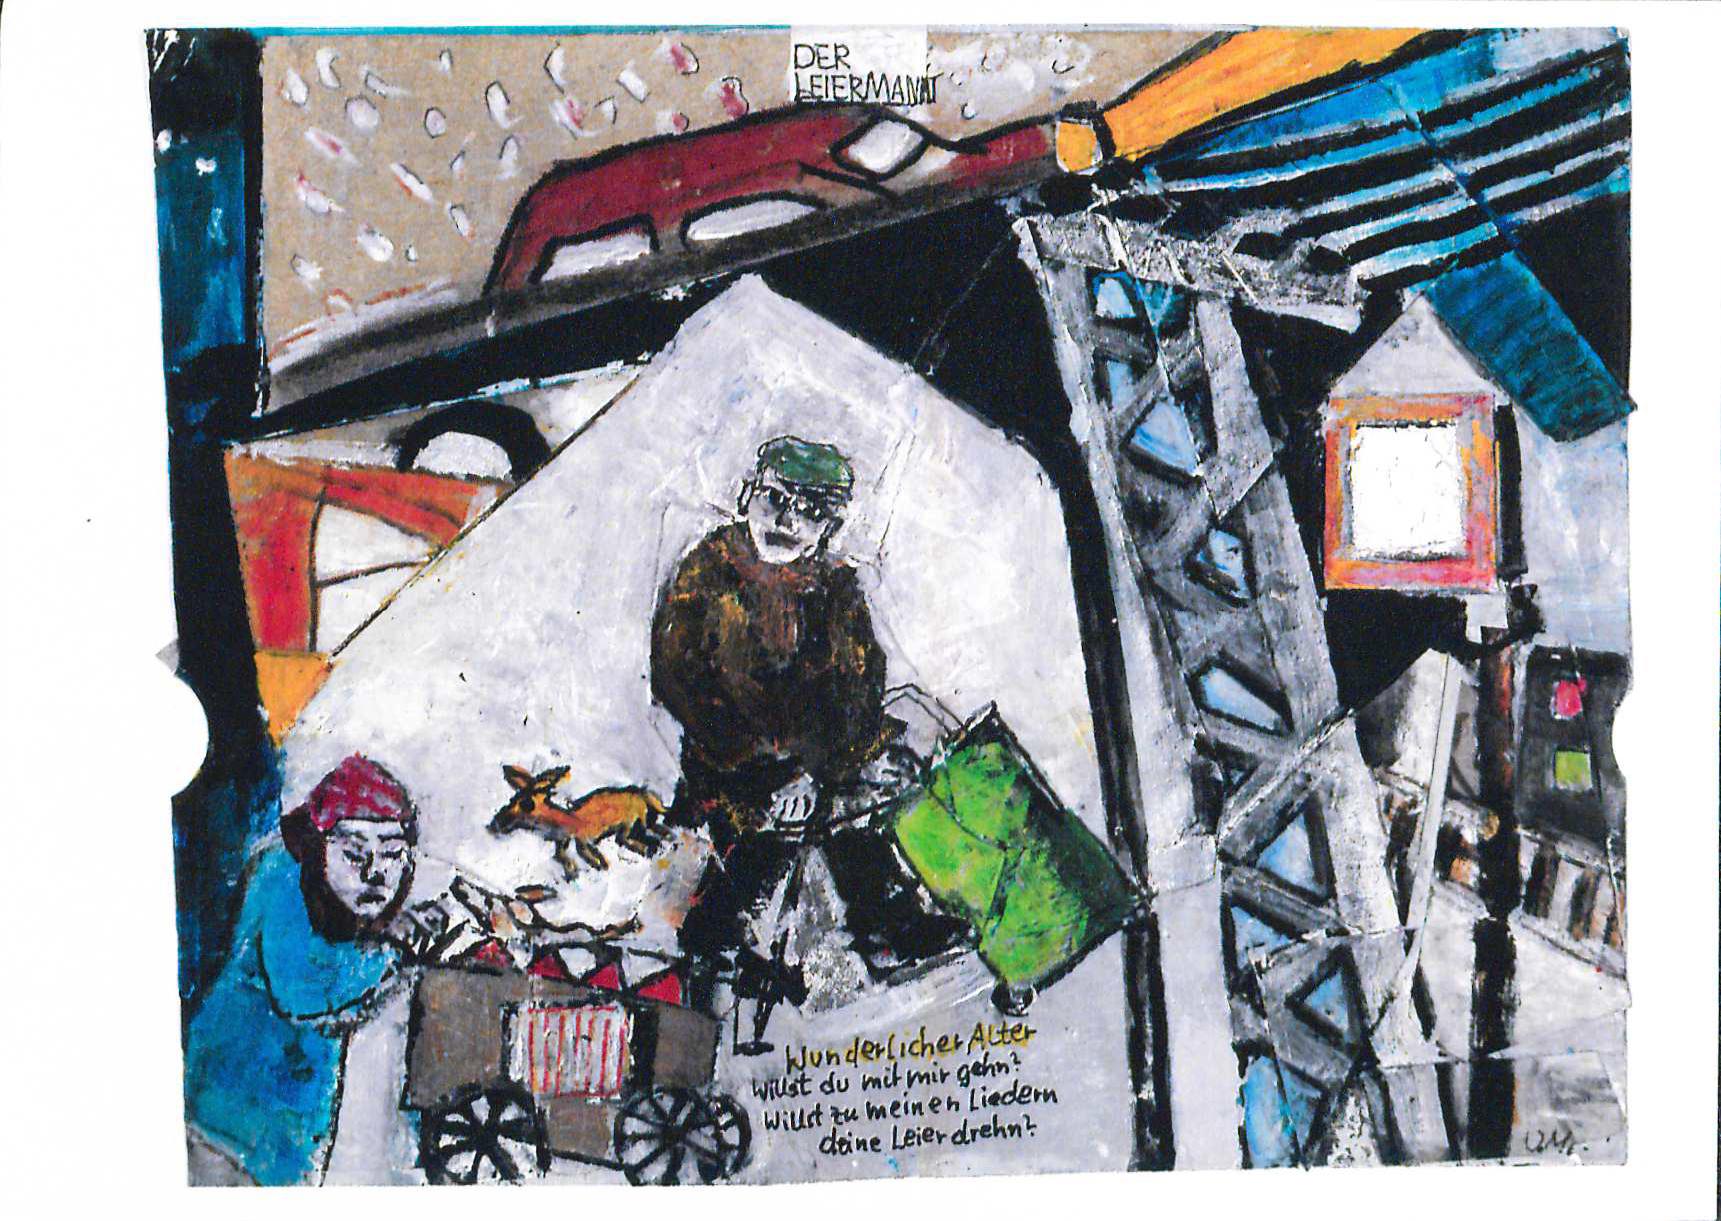 Metsk_Winterreise-24-Der-Leiermann.jpg